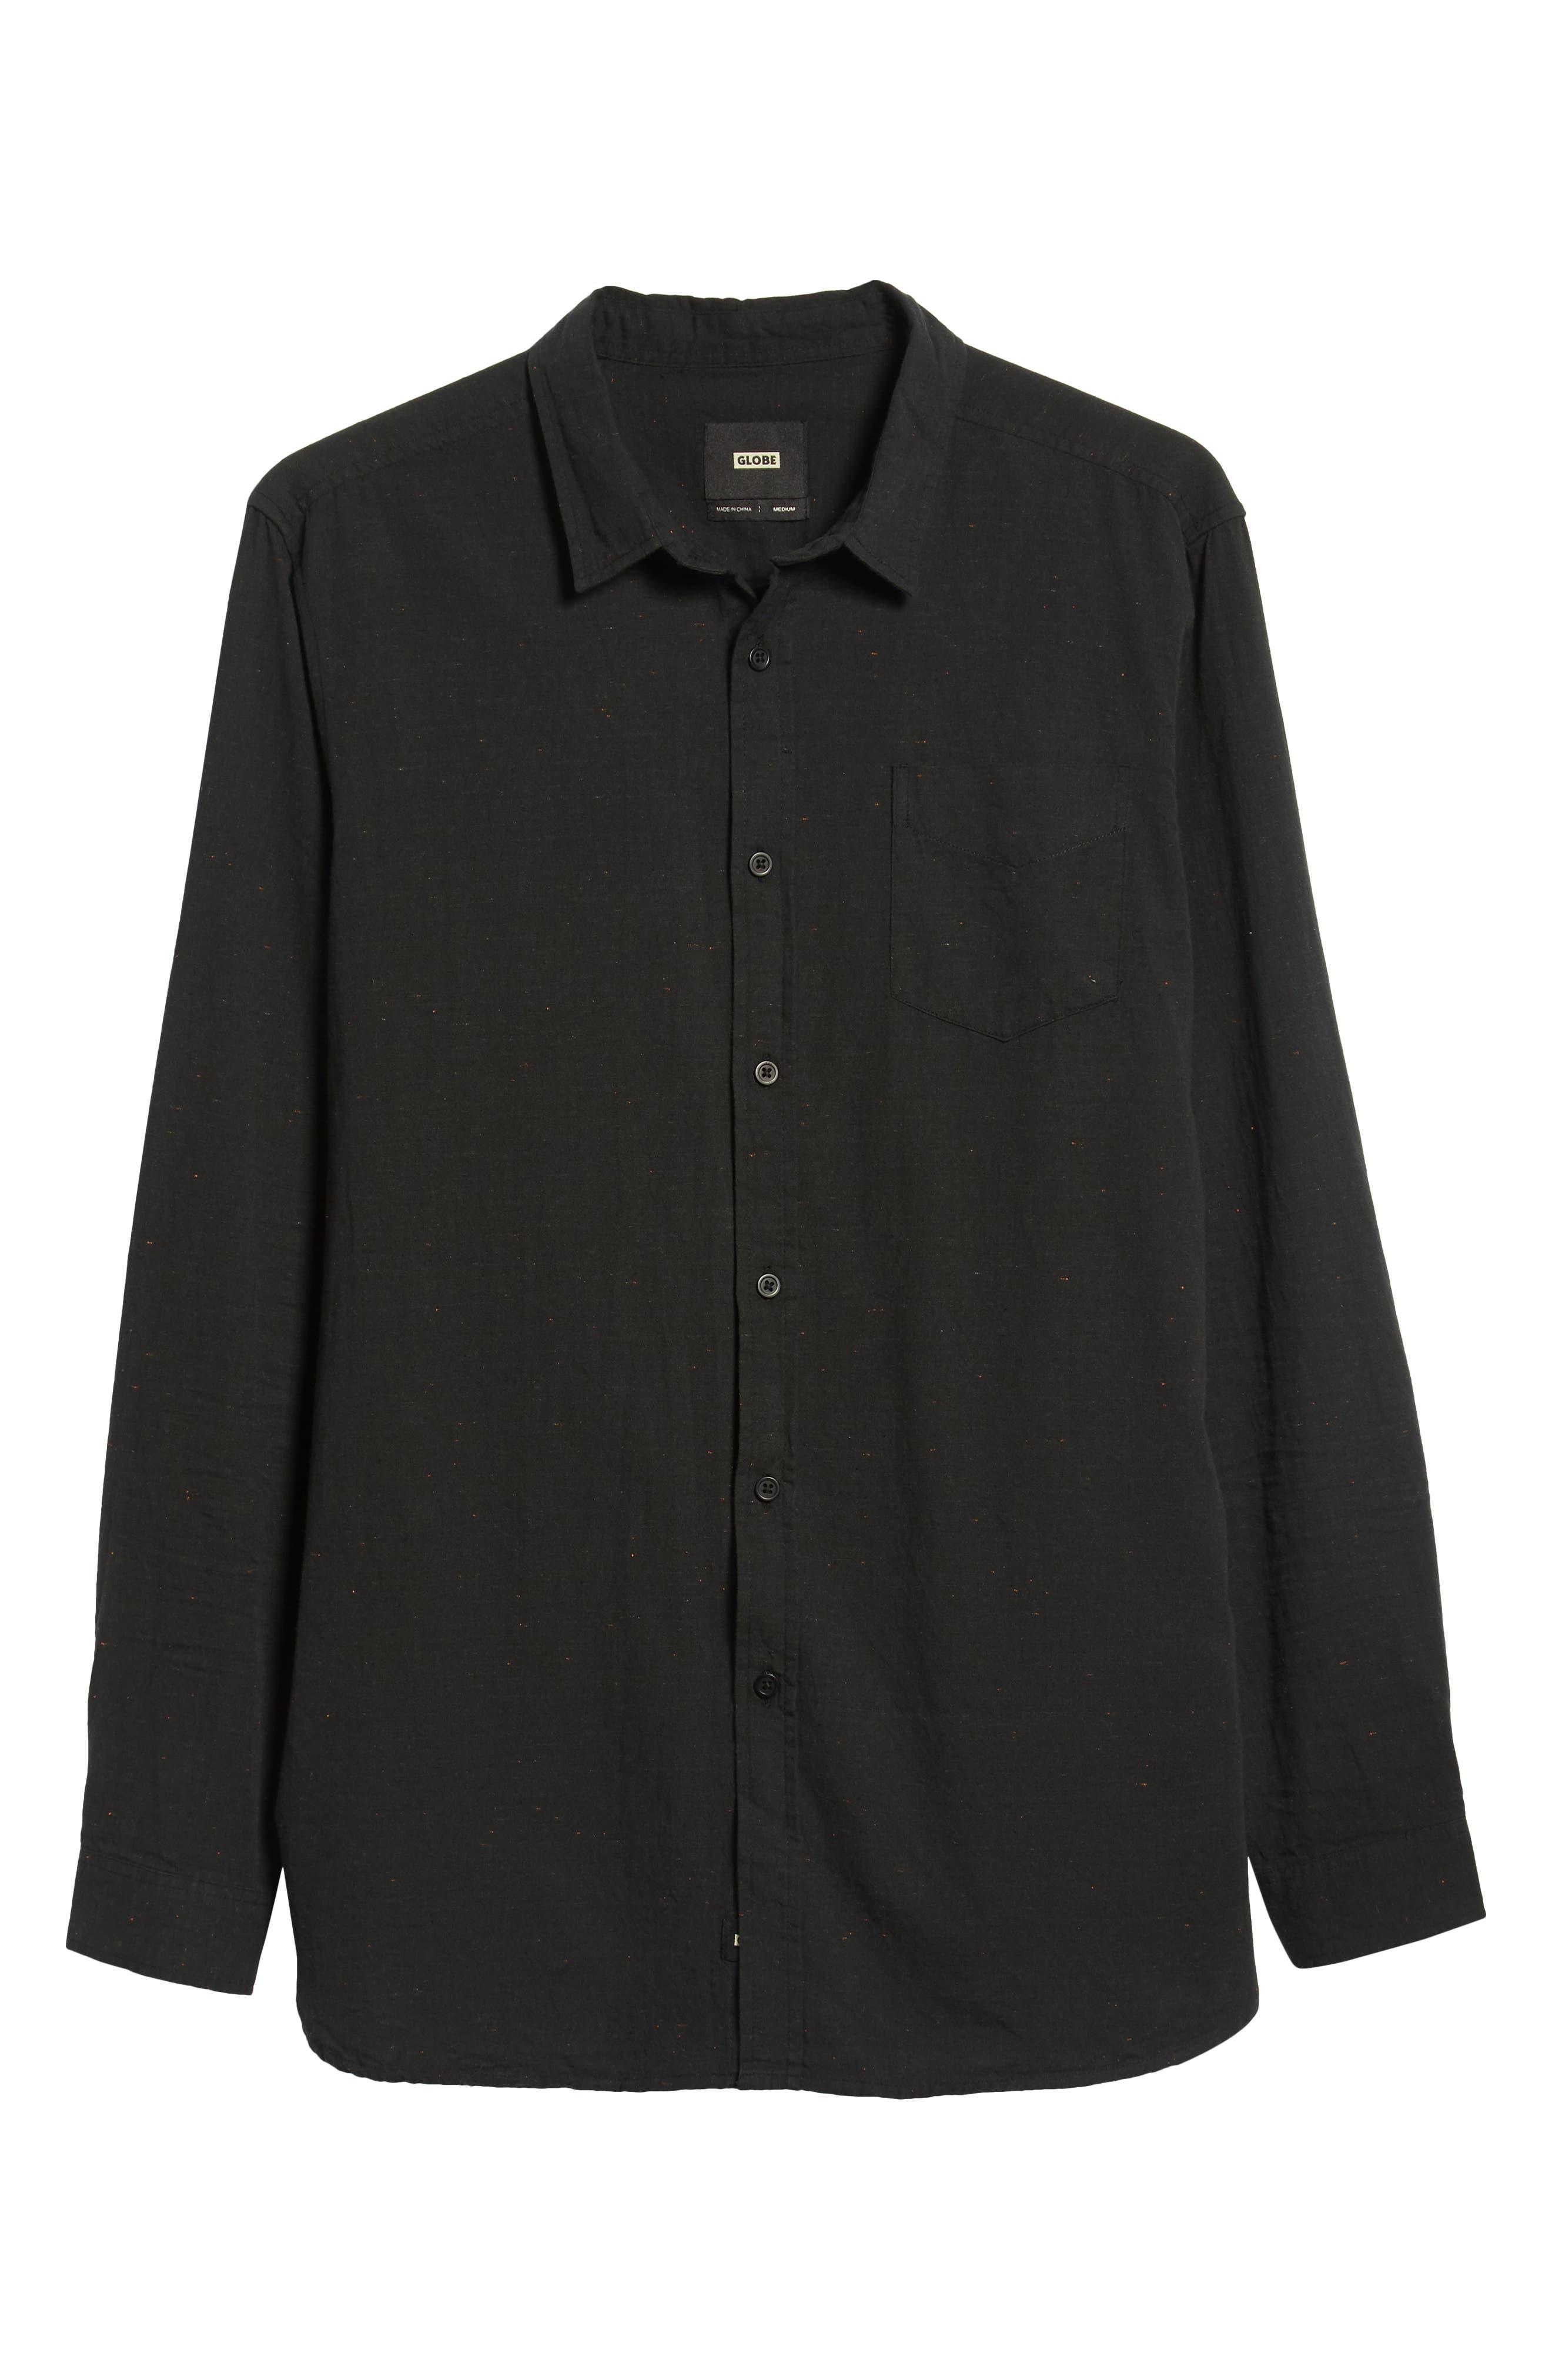 Goodstock Long Sleeve Shirt,                             Alternate thumbnail 6, color,                             LEAD